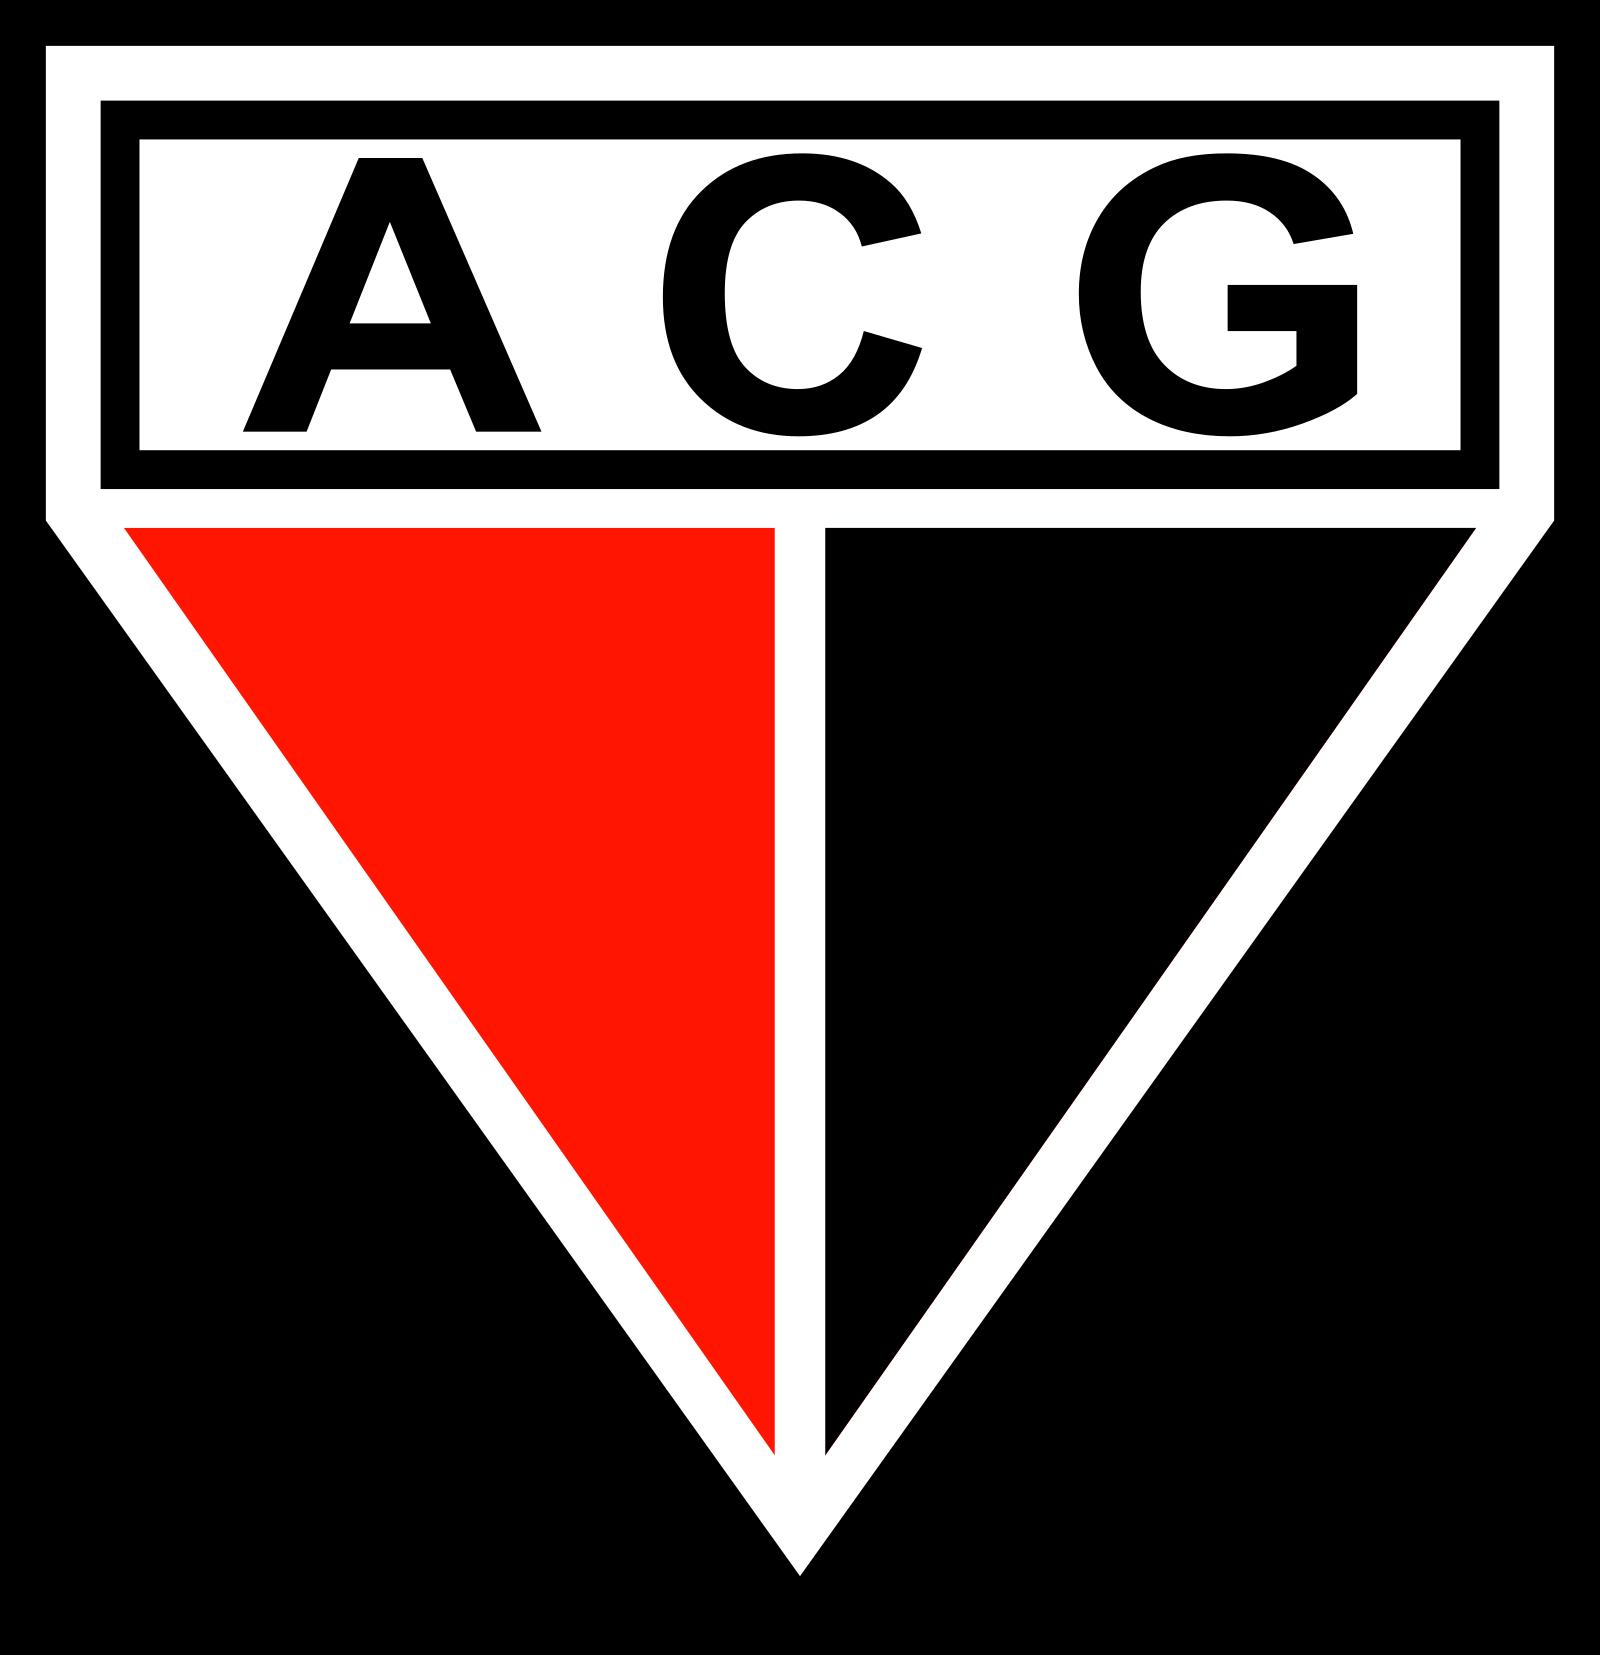 atletico go logo escudo 2 - Atlético Goianiense Logo